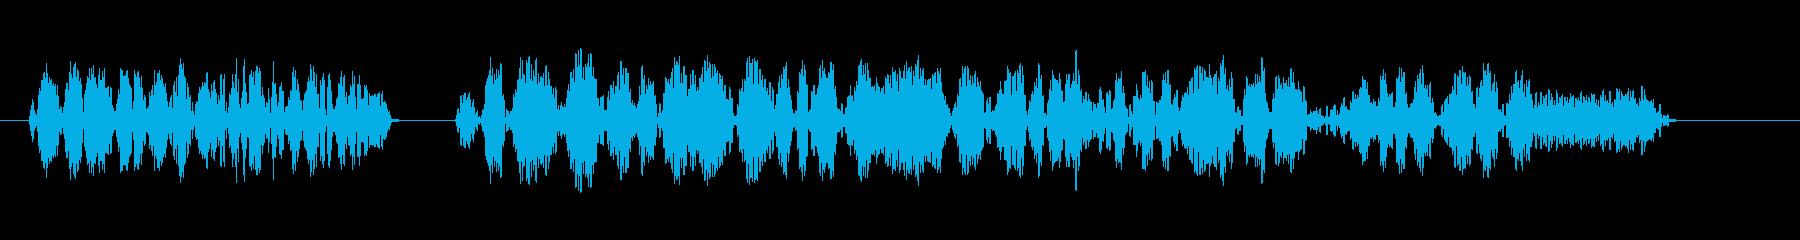 SciFi EC01_91_1の再生済みの波形